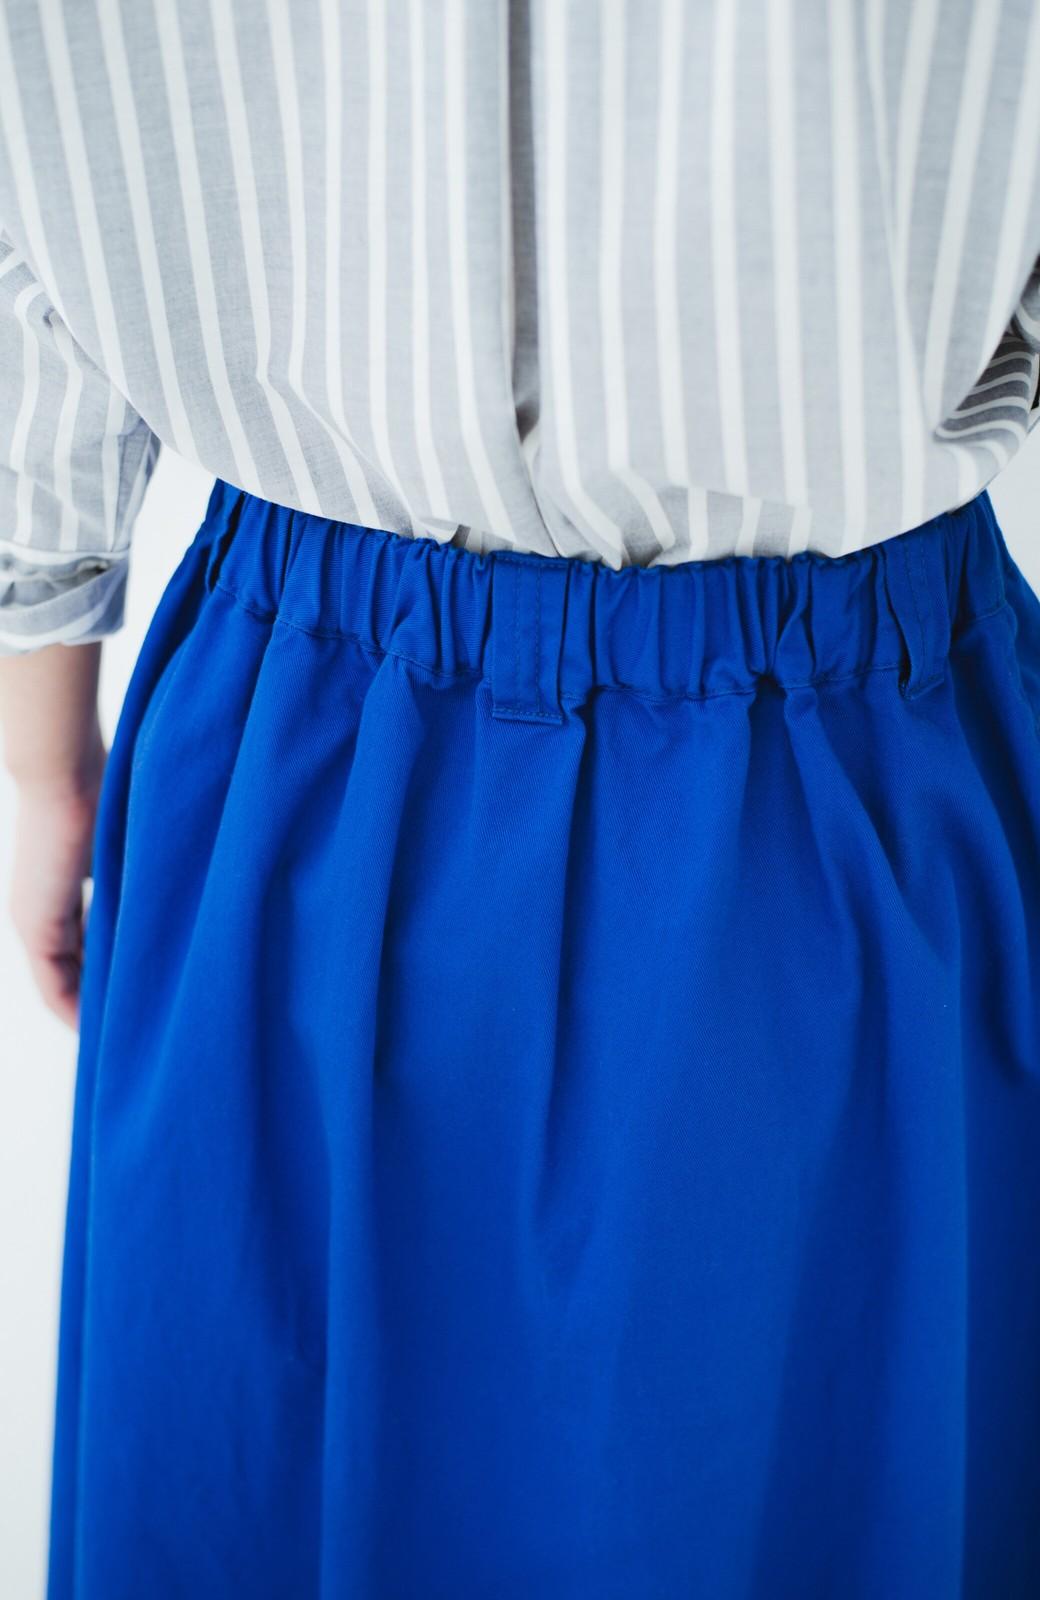 haco! 【今年も再販!】ロングシーズン楽しめる タックボリュームのチノロングスカート <ブルー>の商品写真9